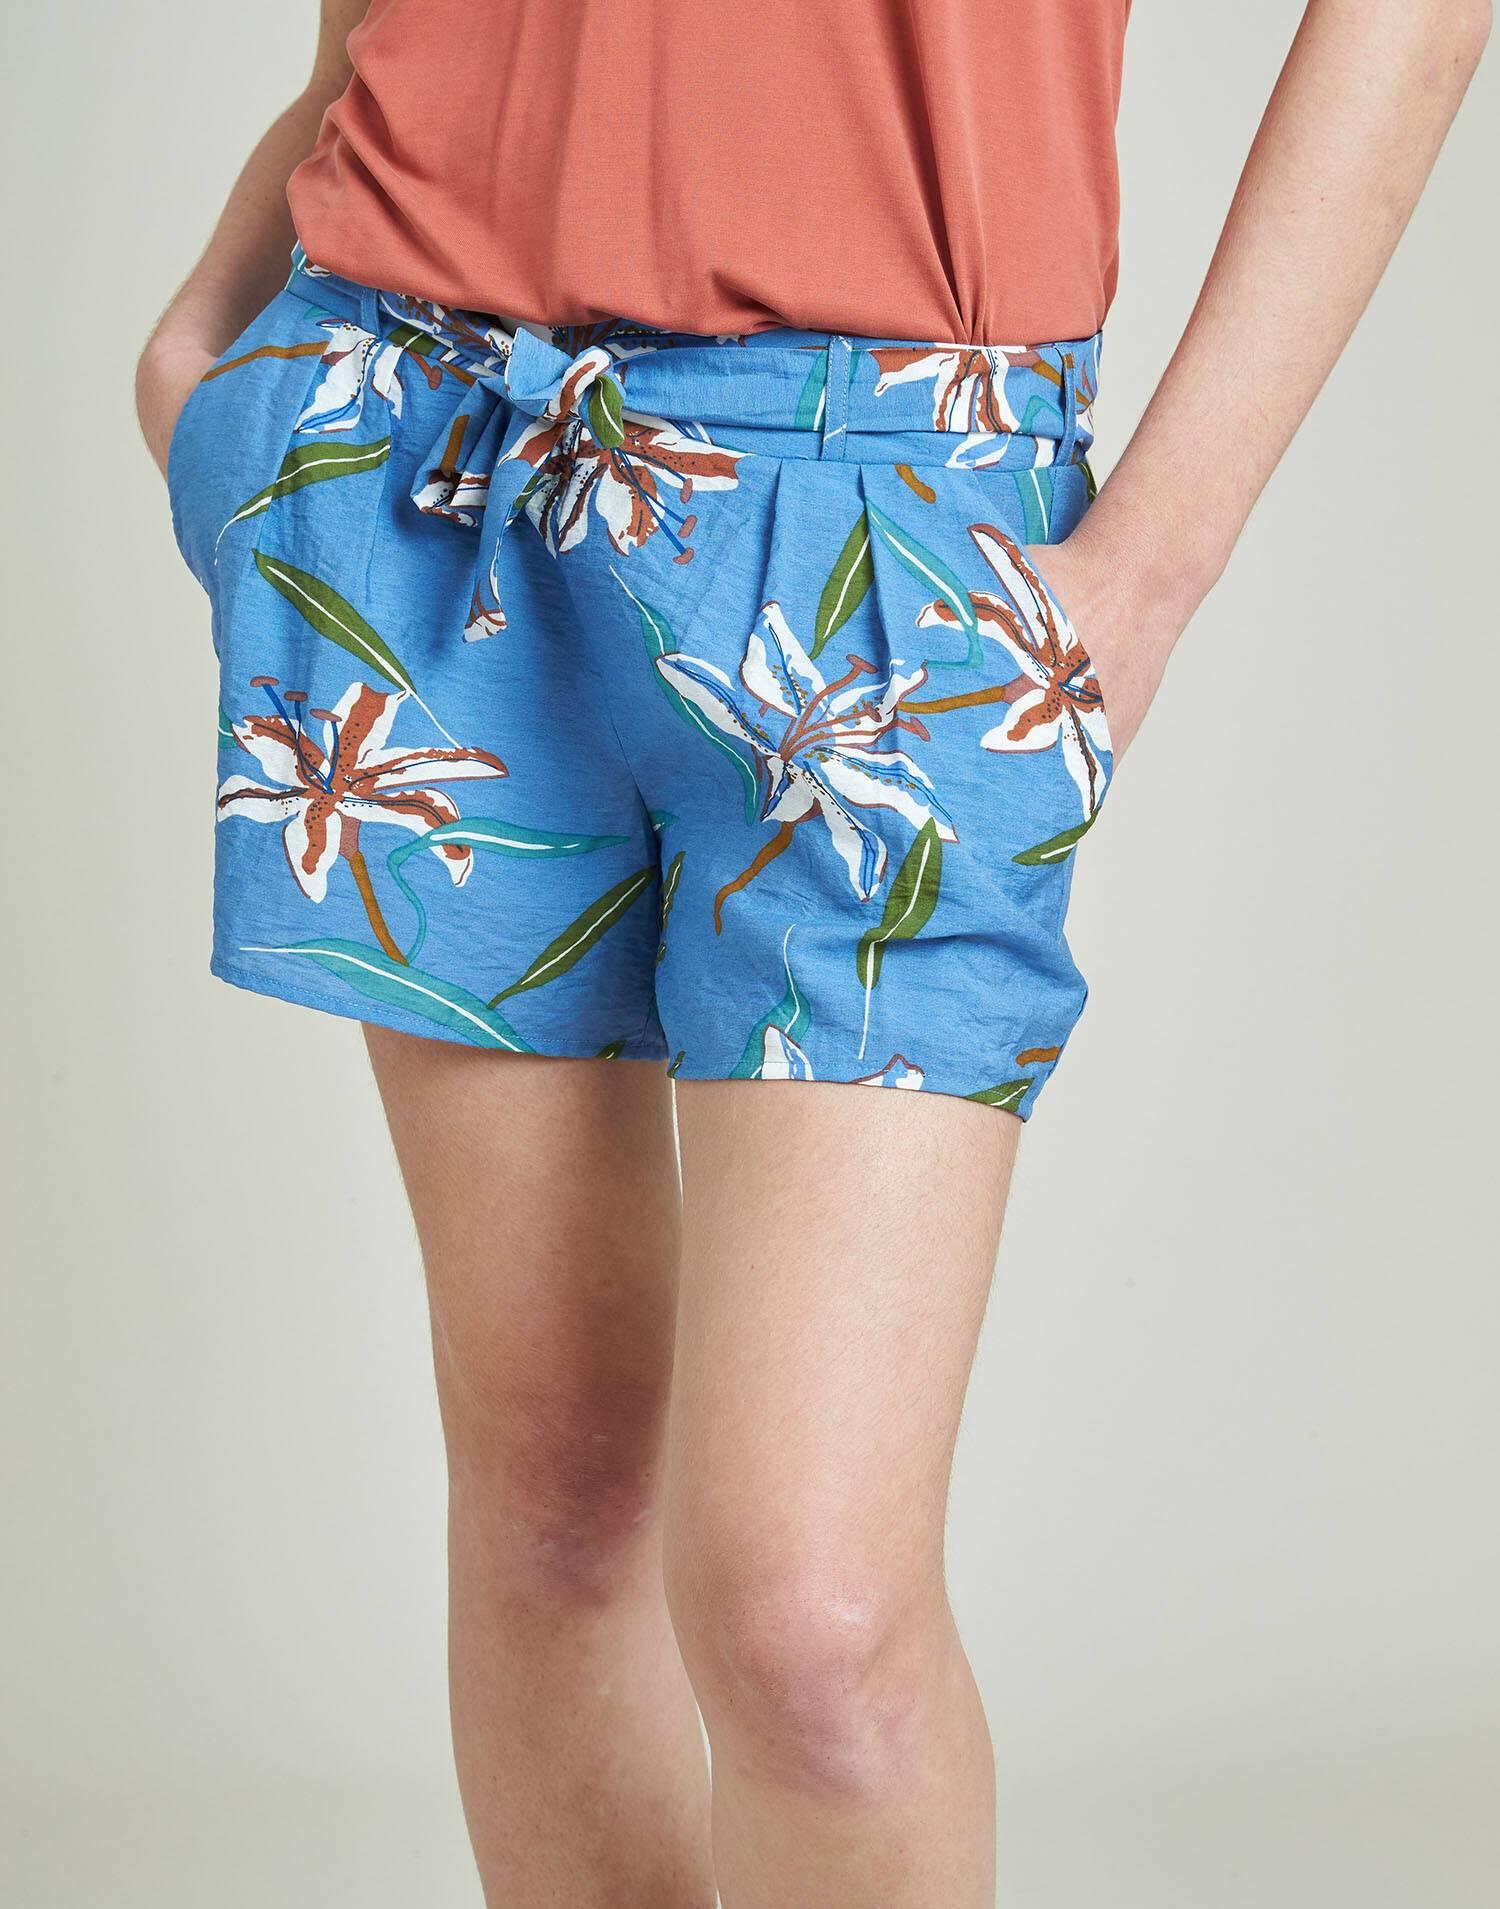 Flowered elastic short with belt